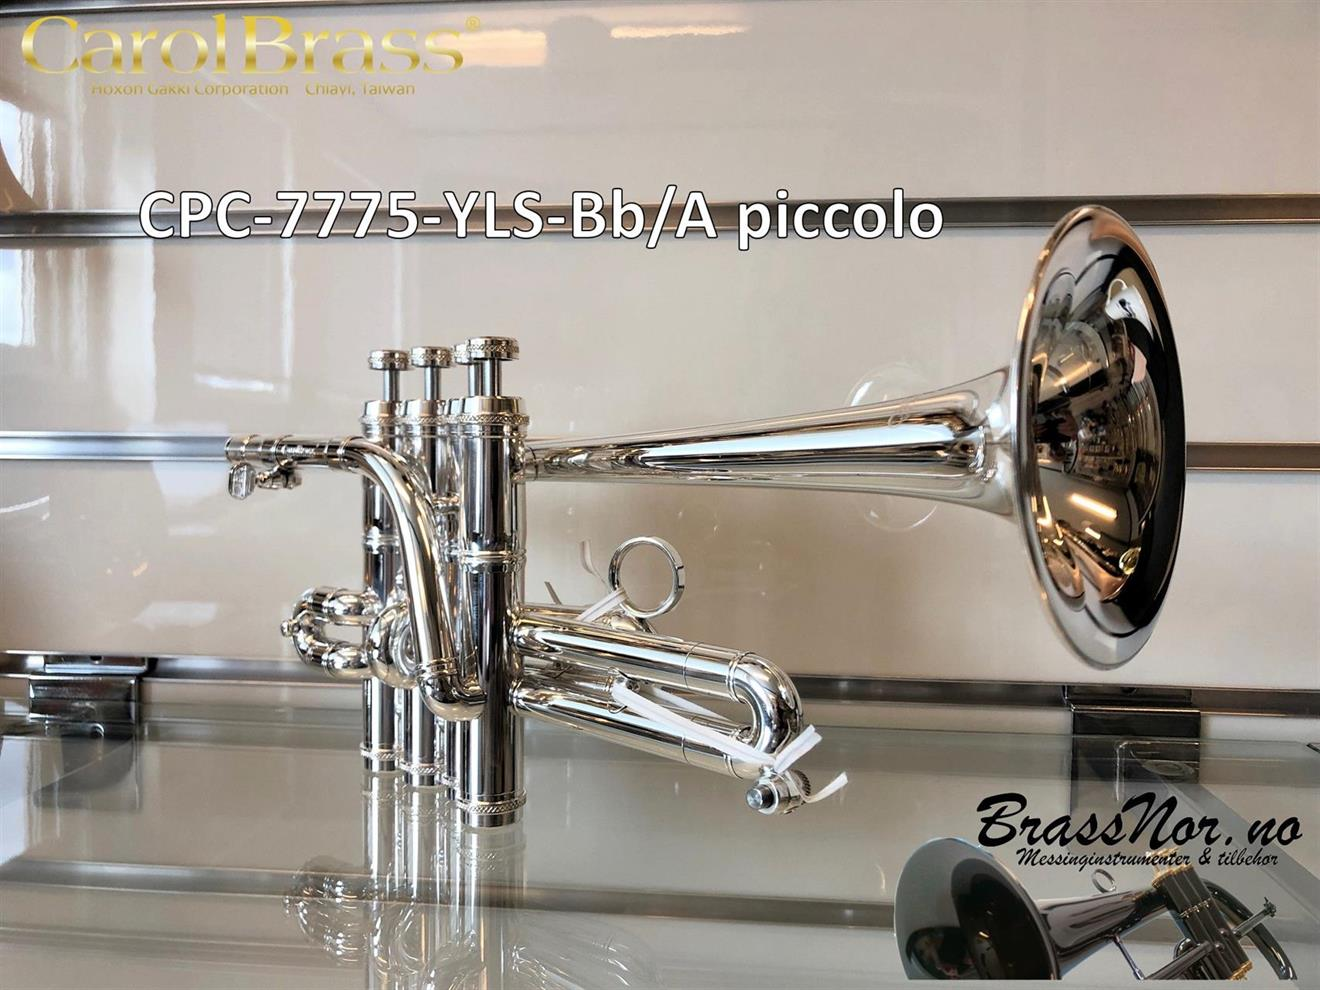 Piccolo CPC-7770-YLS 70% gul messing - sølv